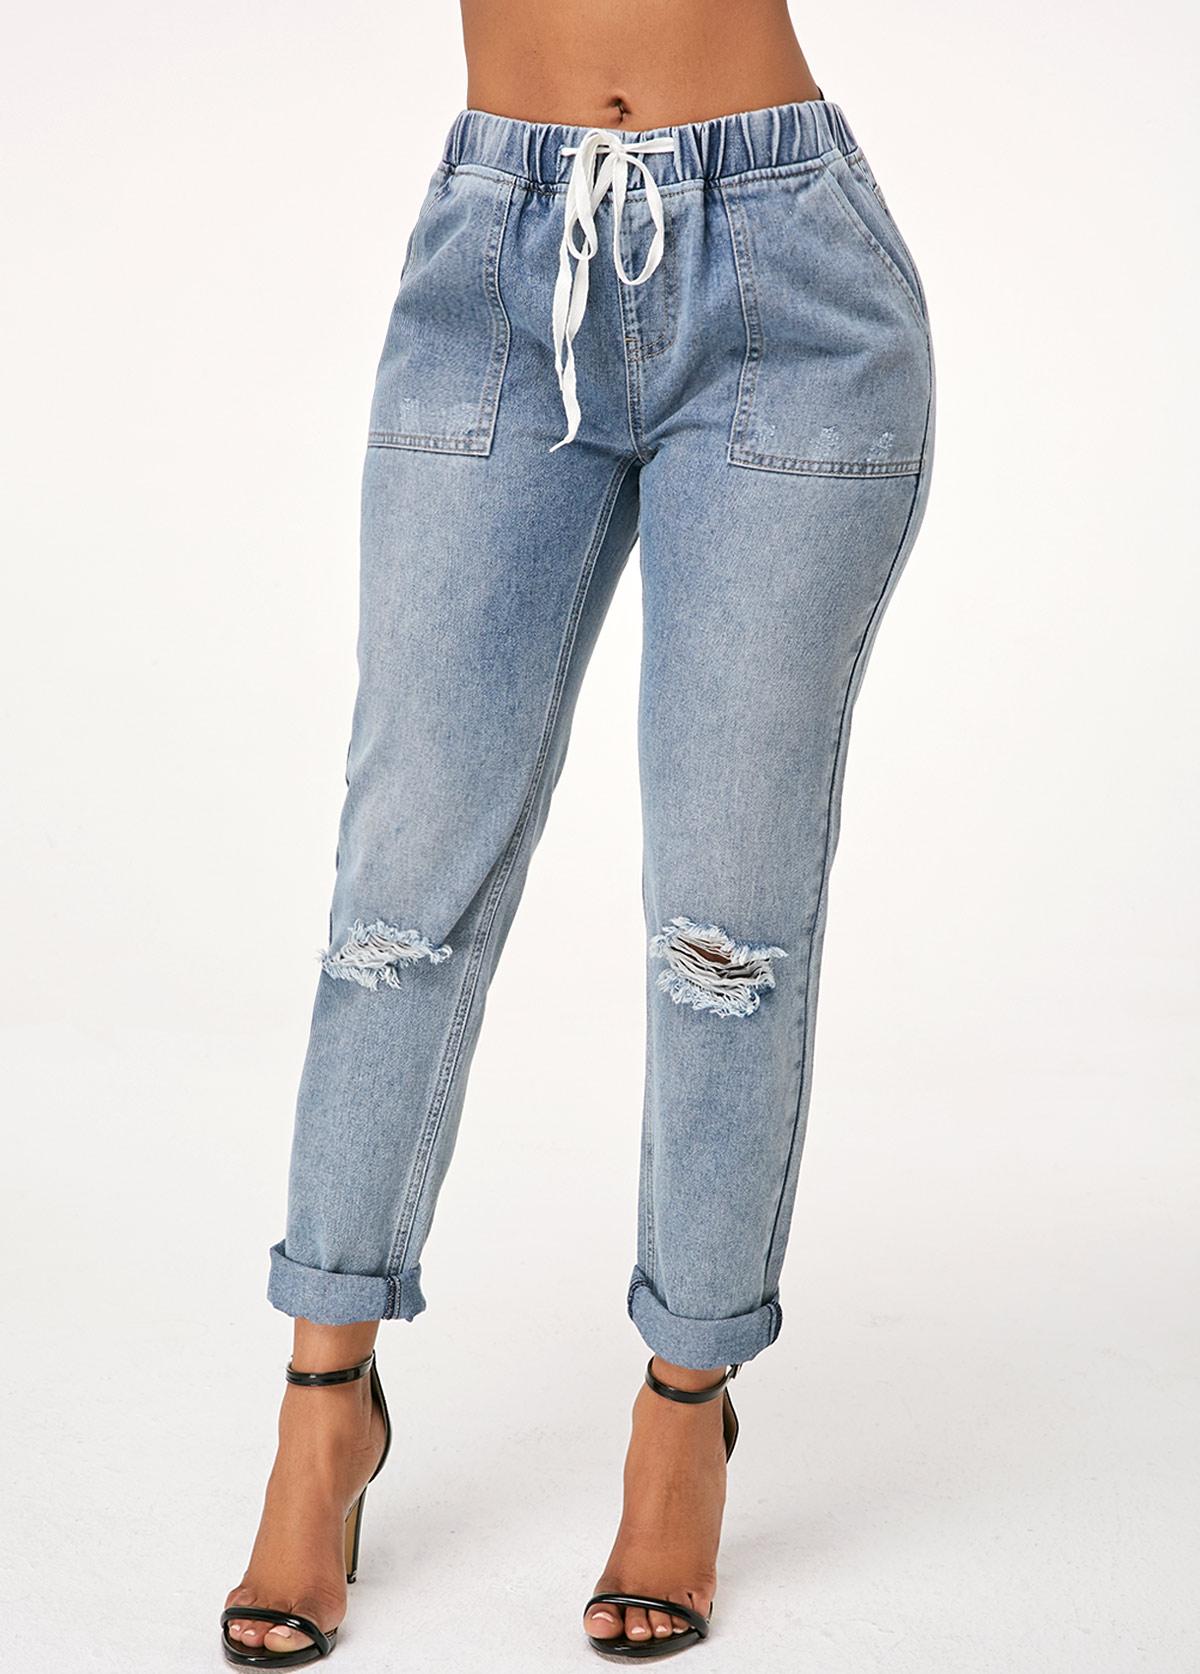 ROTITA Acid Washed Shredded Denim Blue Pants